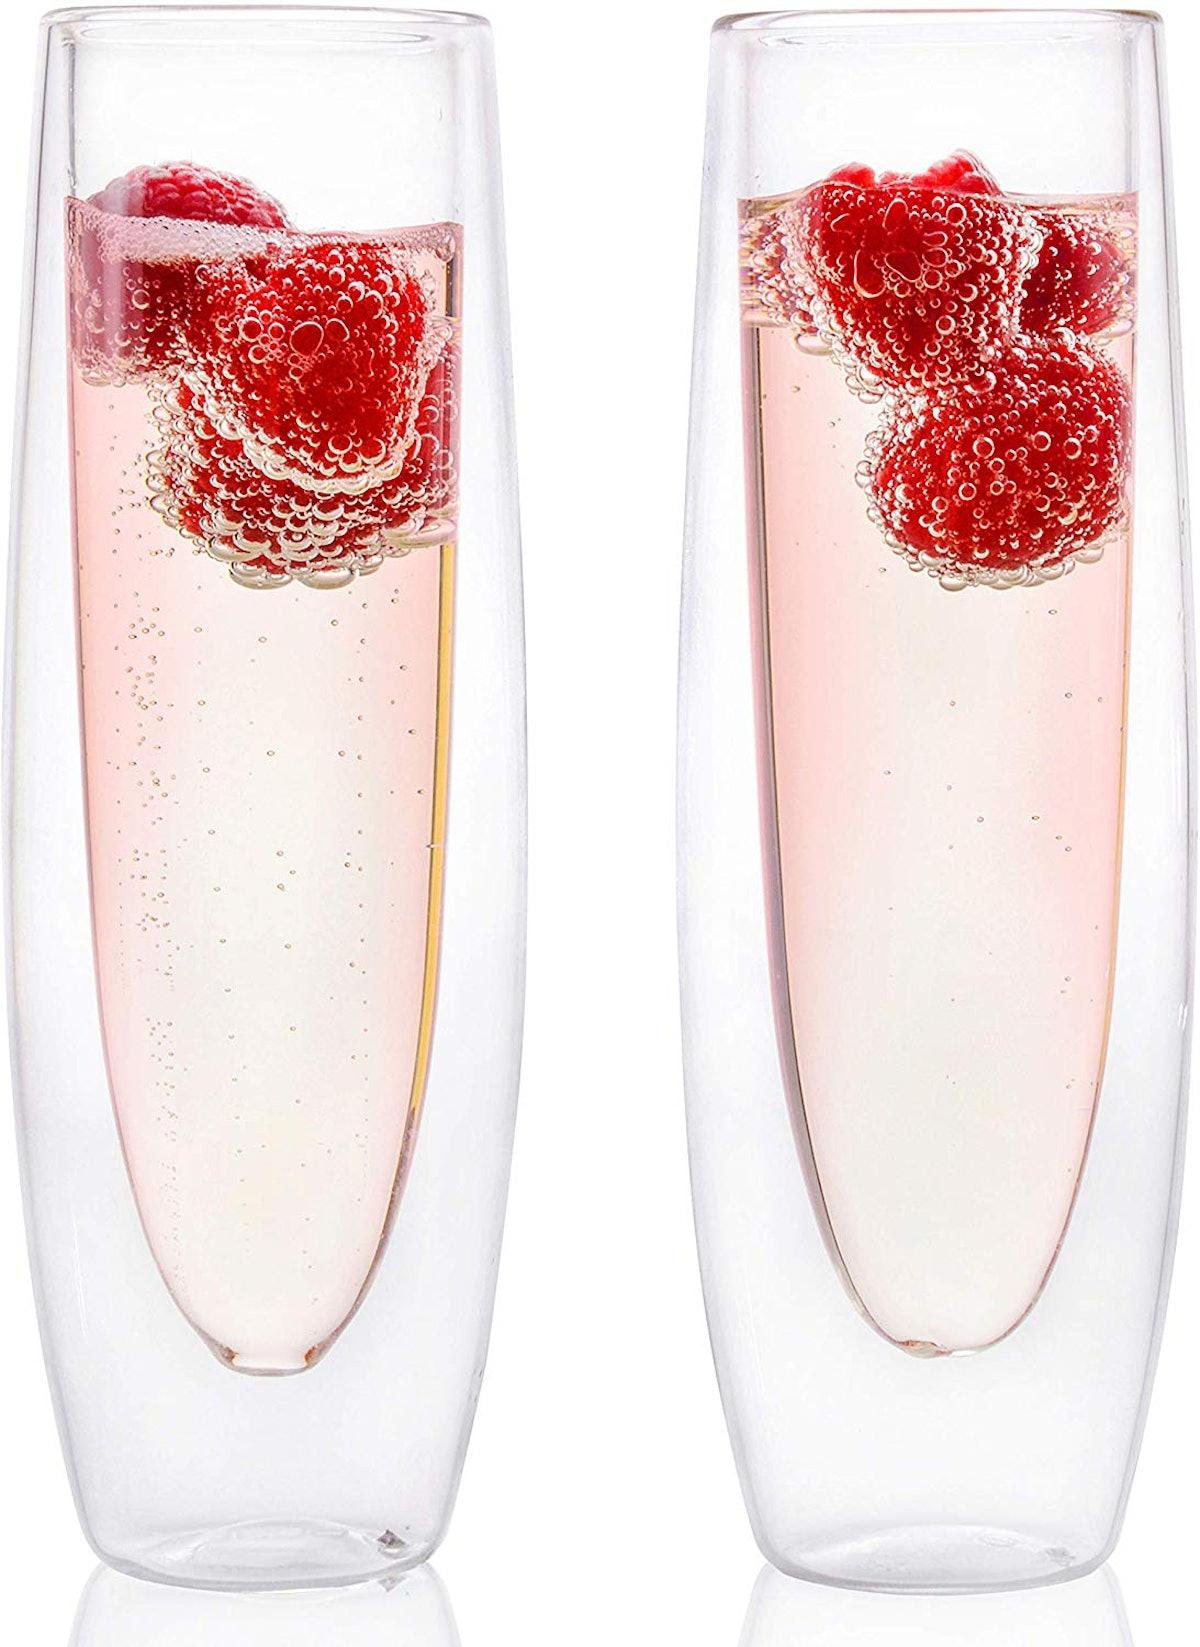 Eparé Stemless Champagne Flutes (Set of 2)